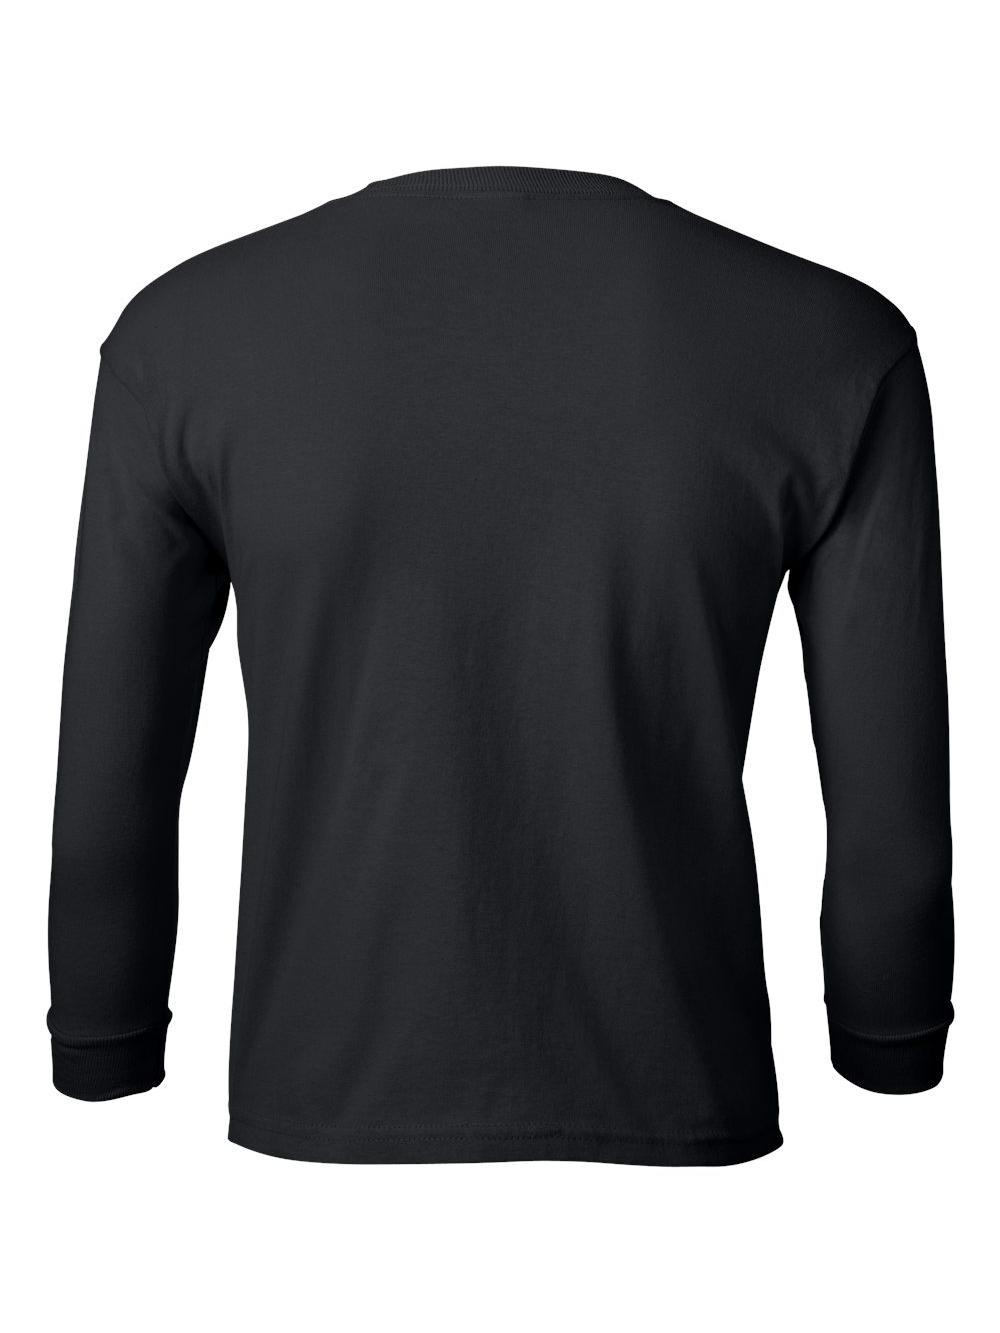 Gildan-Ultra-Cotton-Youth-Long-Sleeve-T-Shirt-2400B thumbnail 7